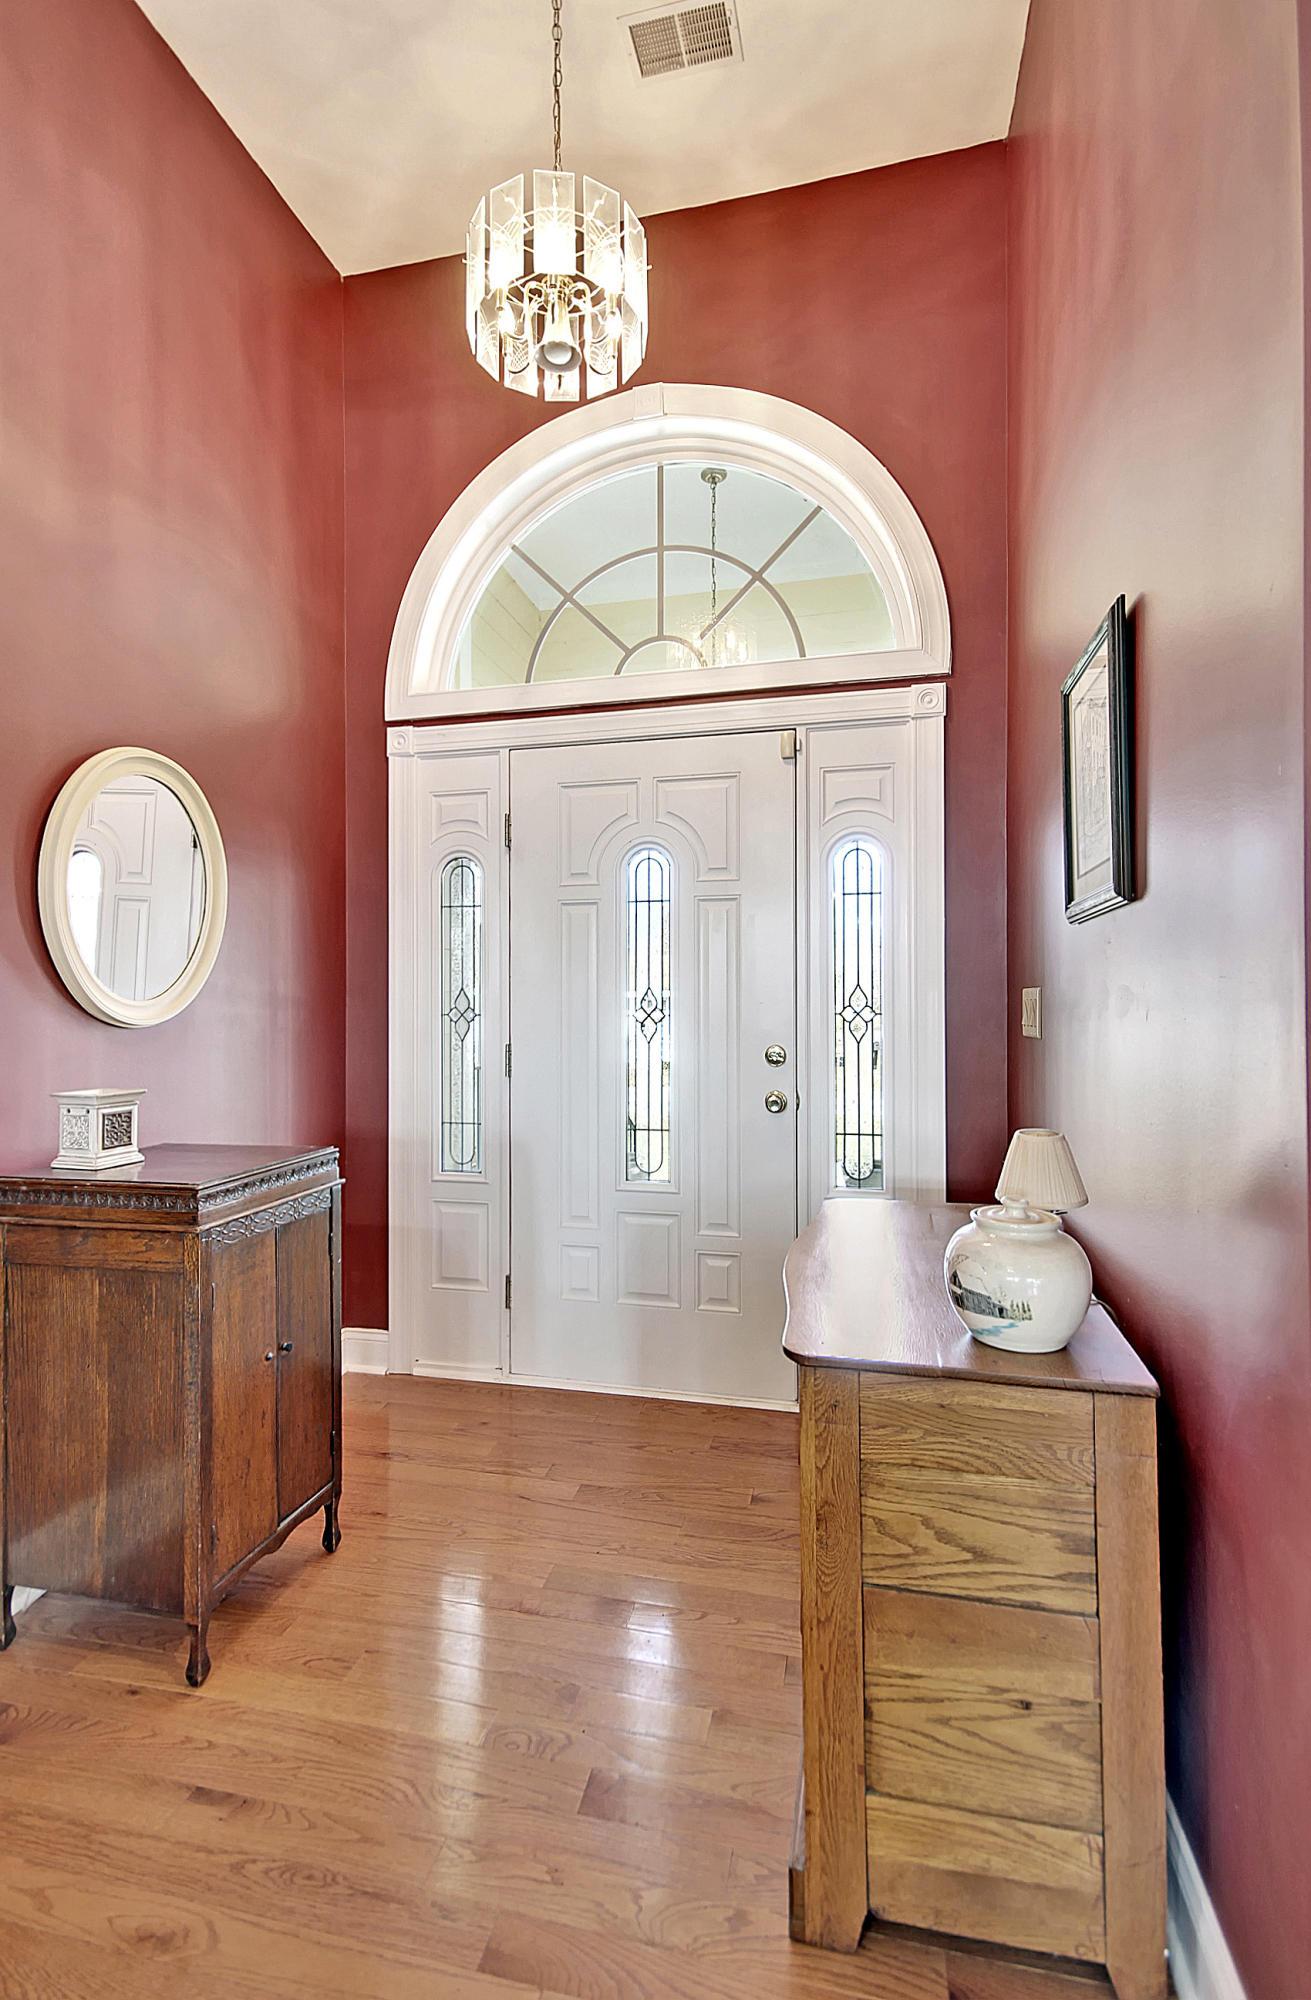 Cross Subd (Longpoint) Homes For Sale - 1191 Longpoint, Cross, SC - 21